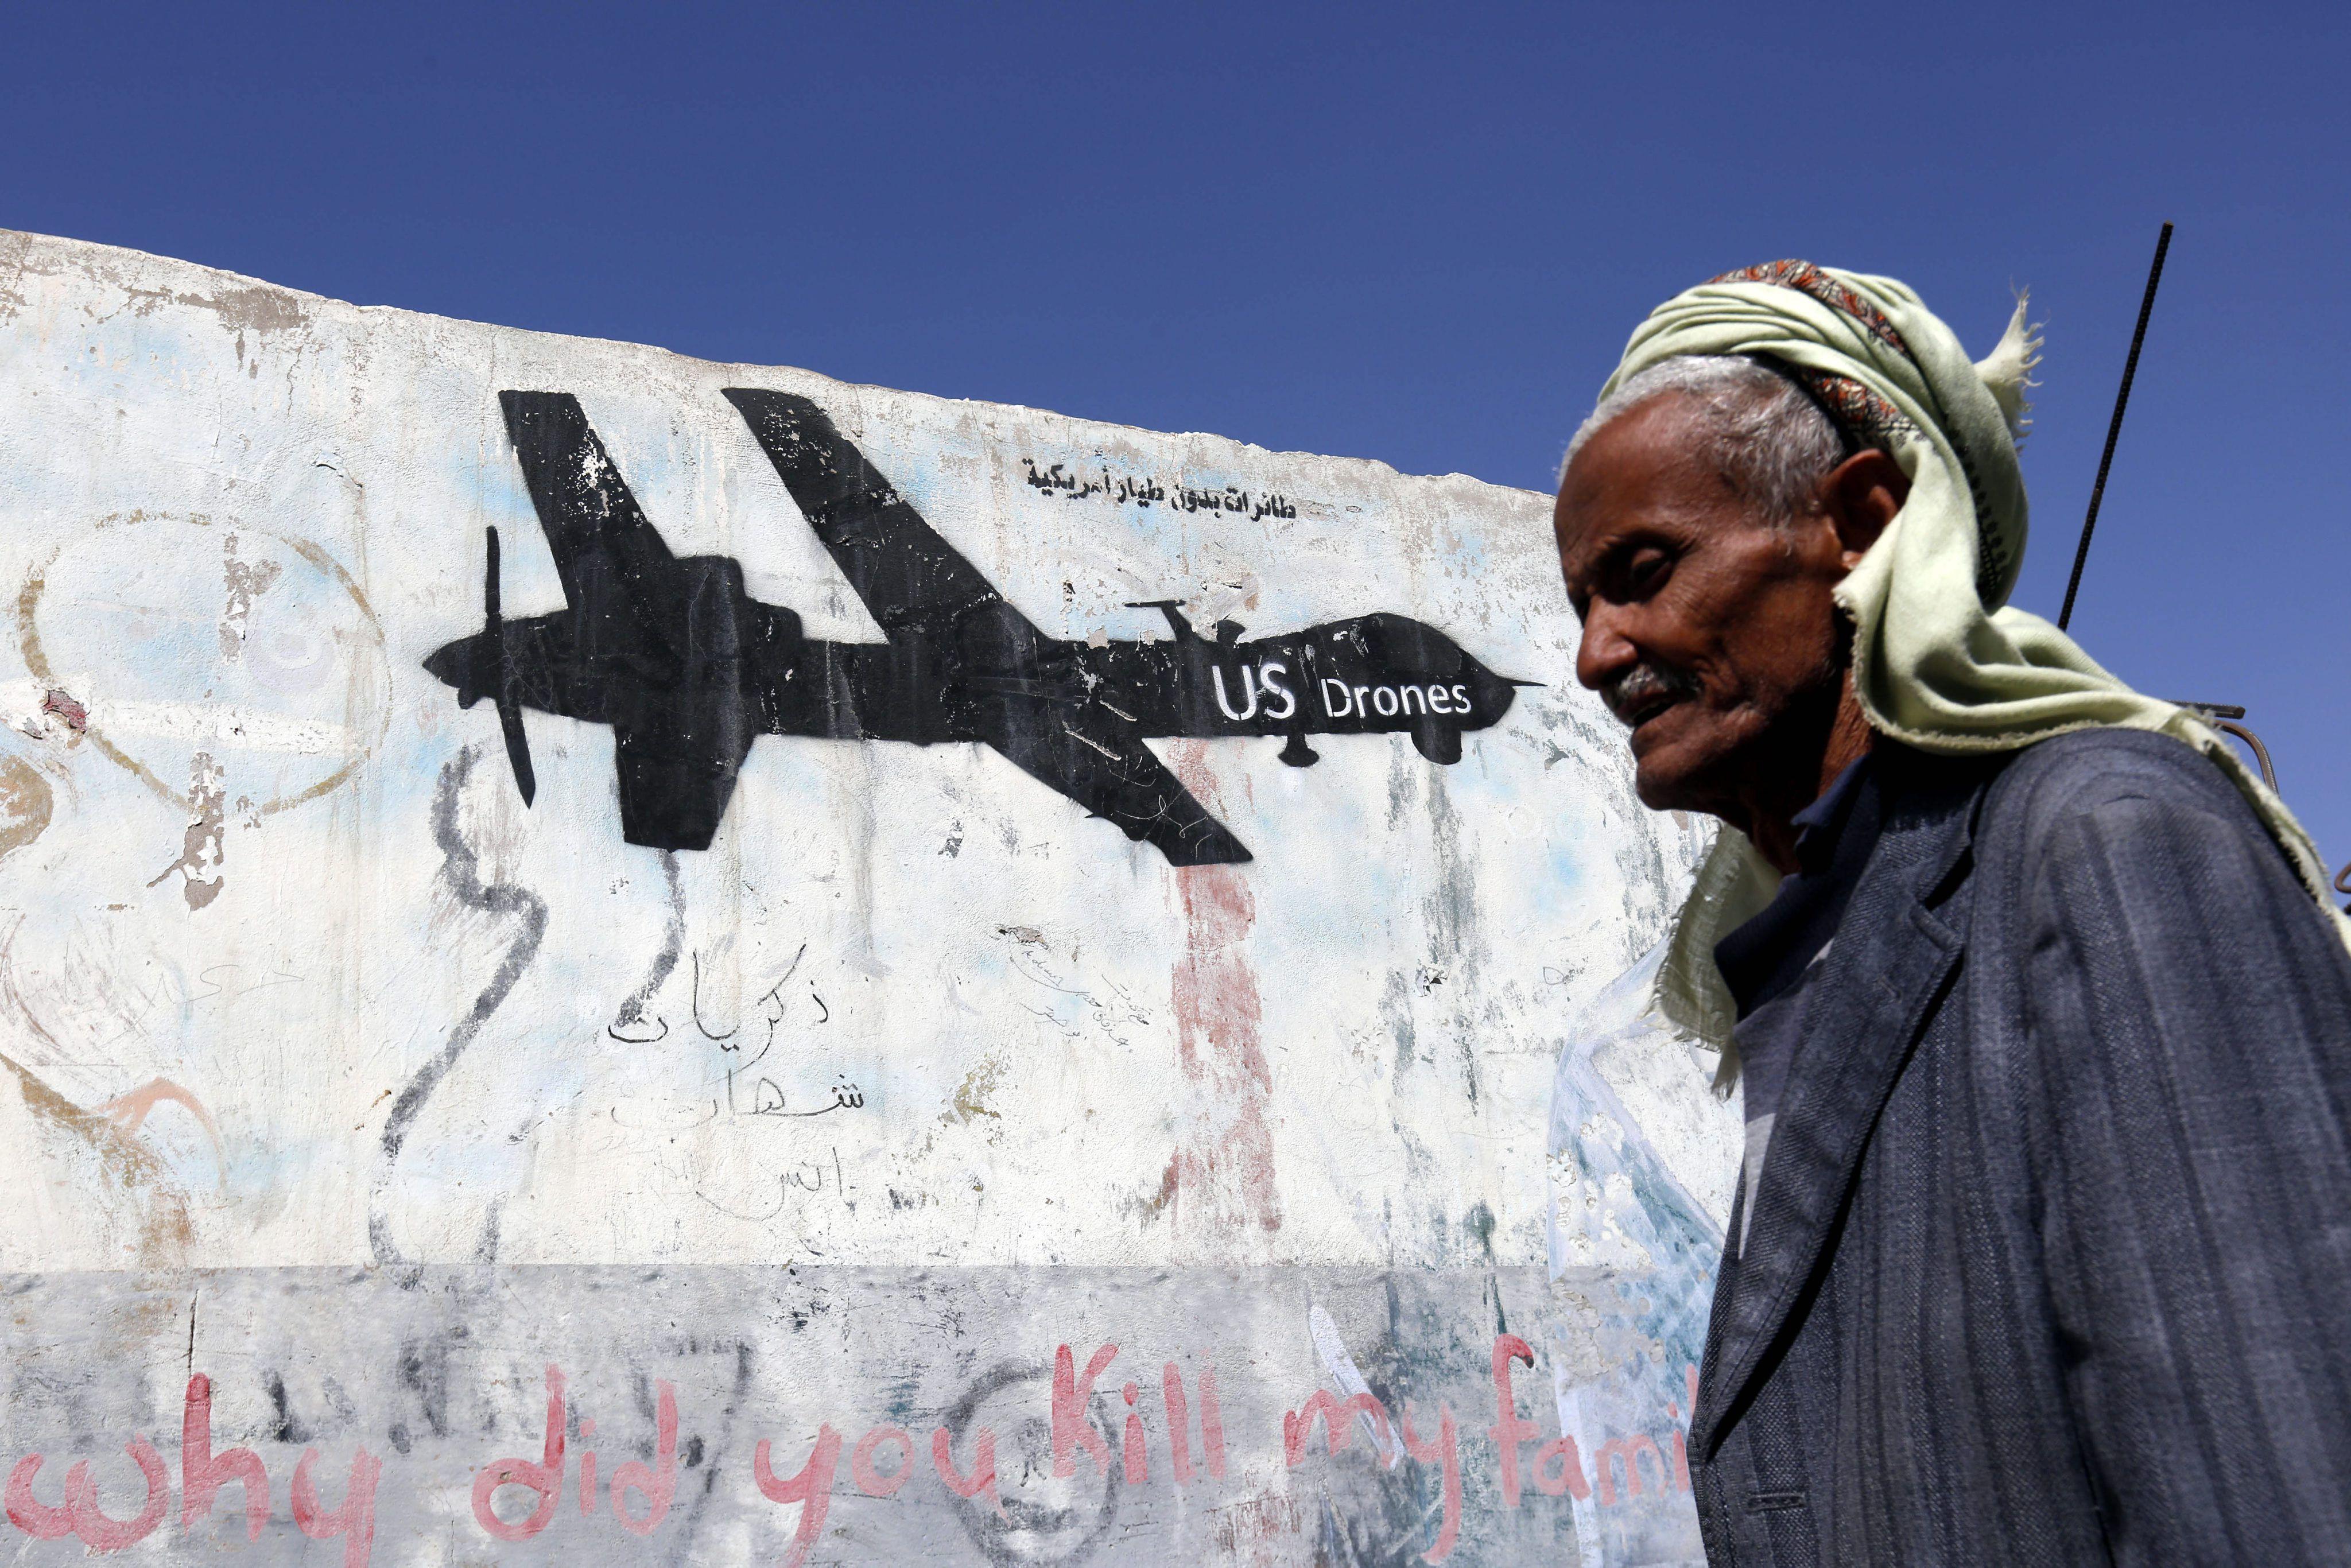 Primer ataque militar de Trump: mató 18 miembros de Al Qaeda y 9 civiles